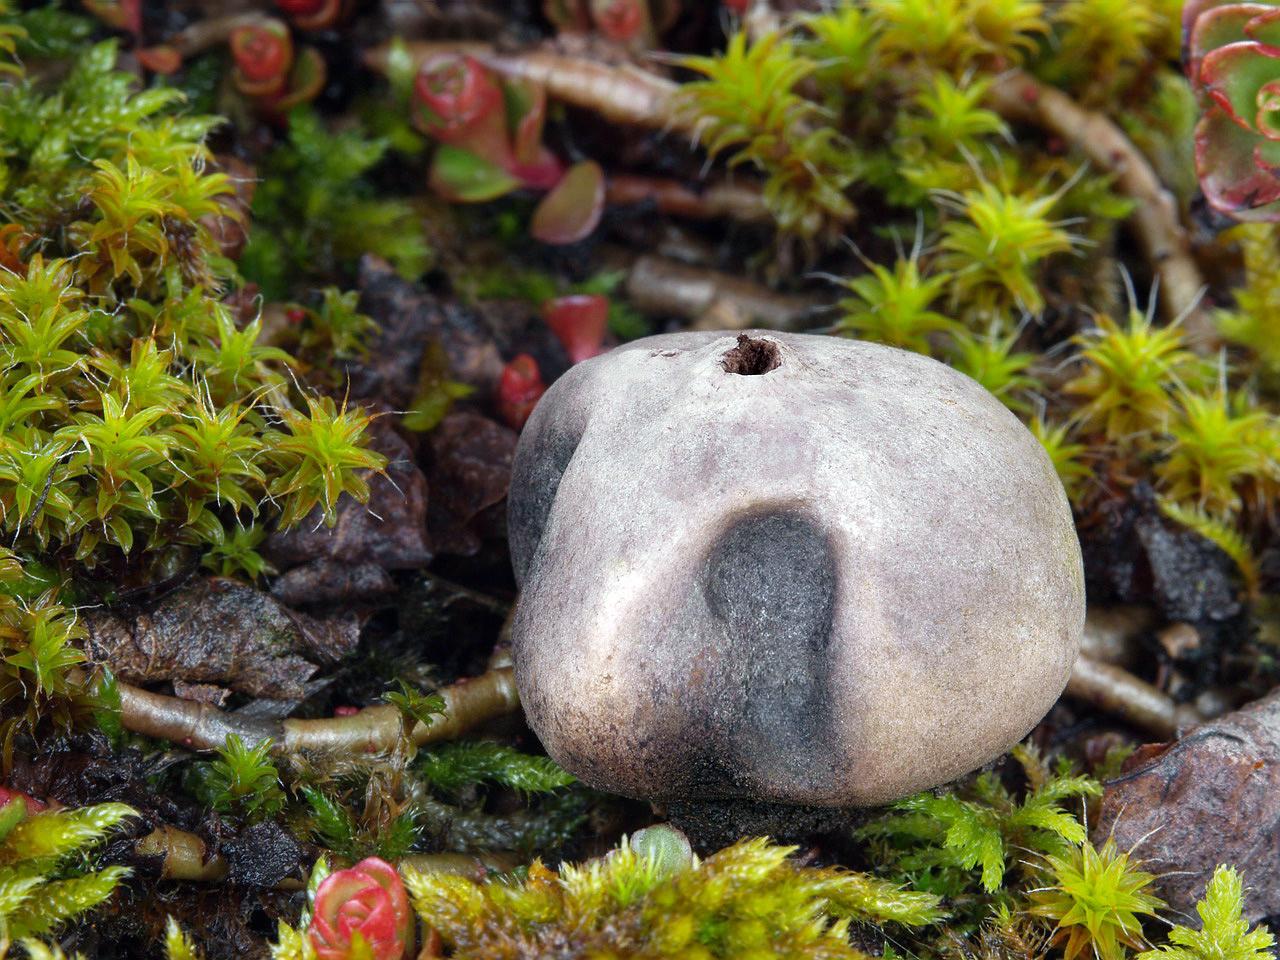 Břichatkovité houby